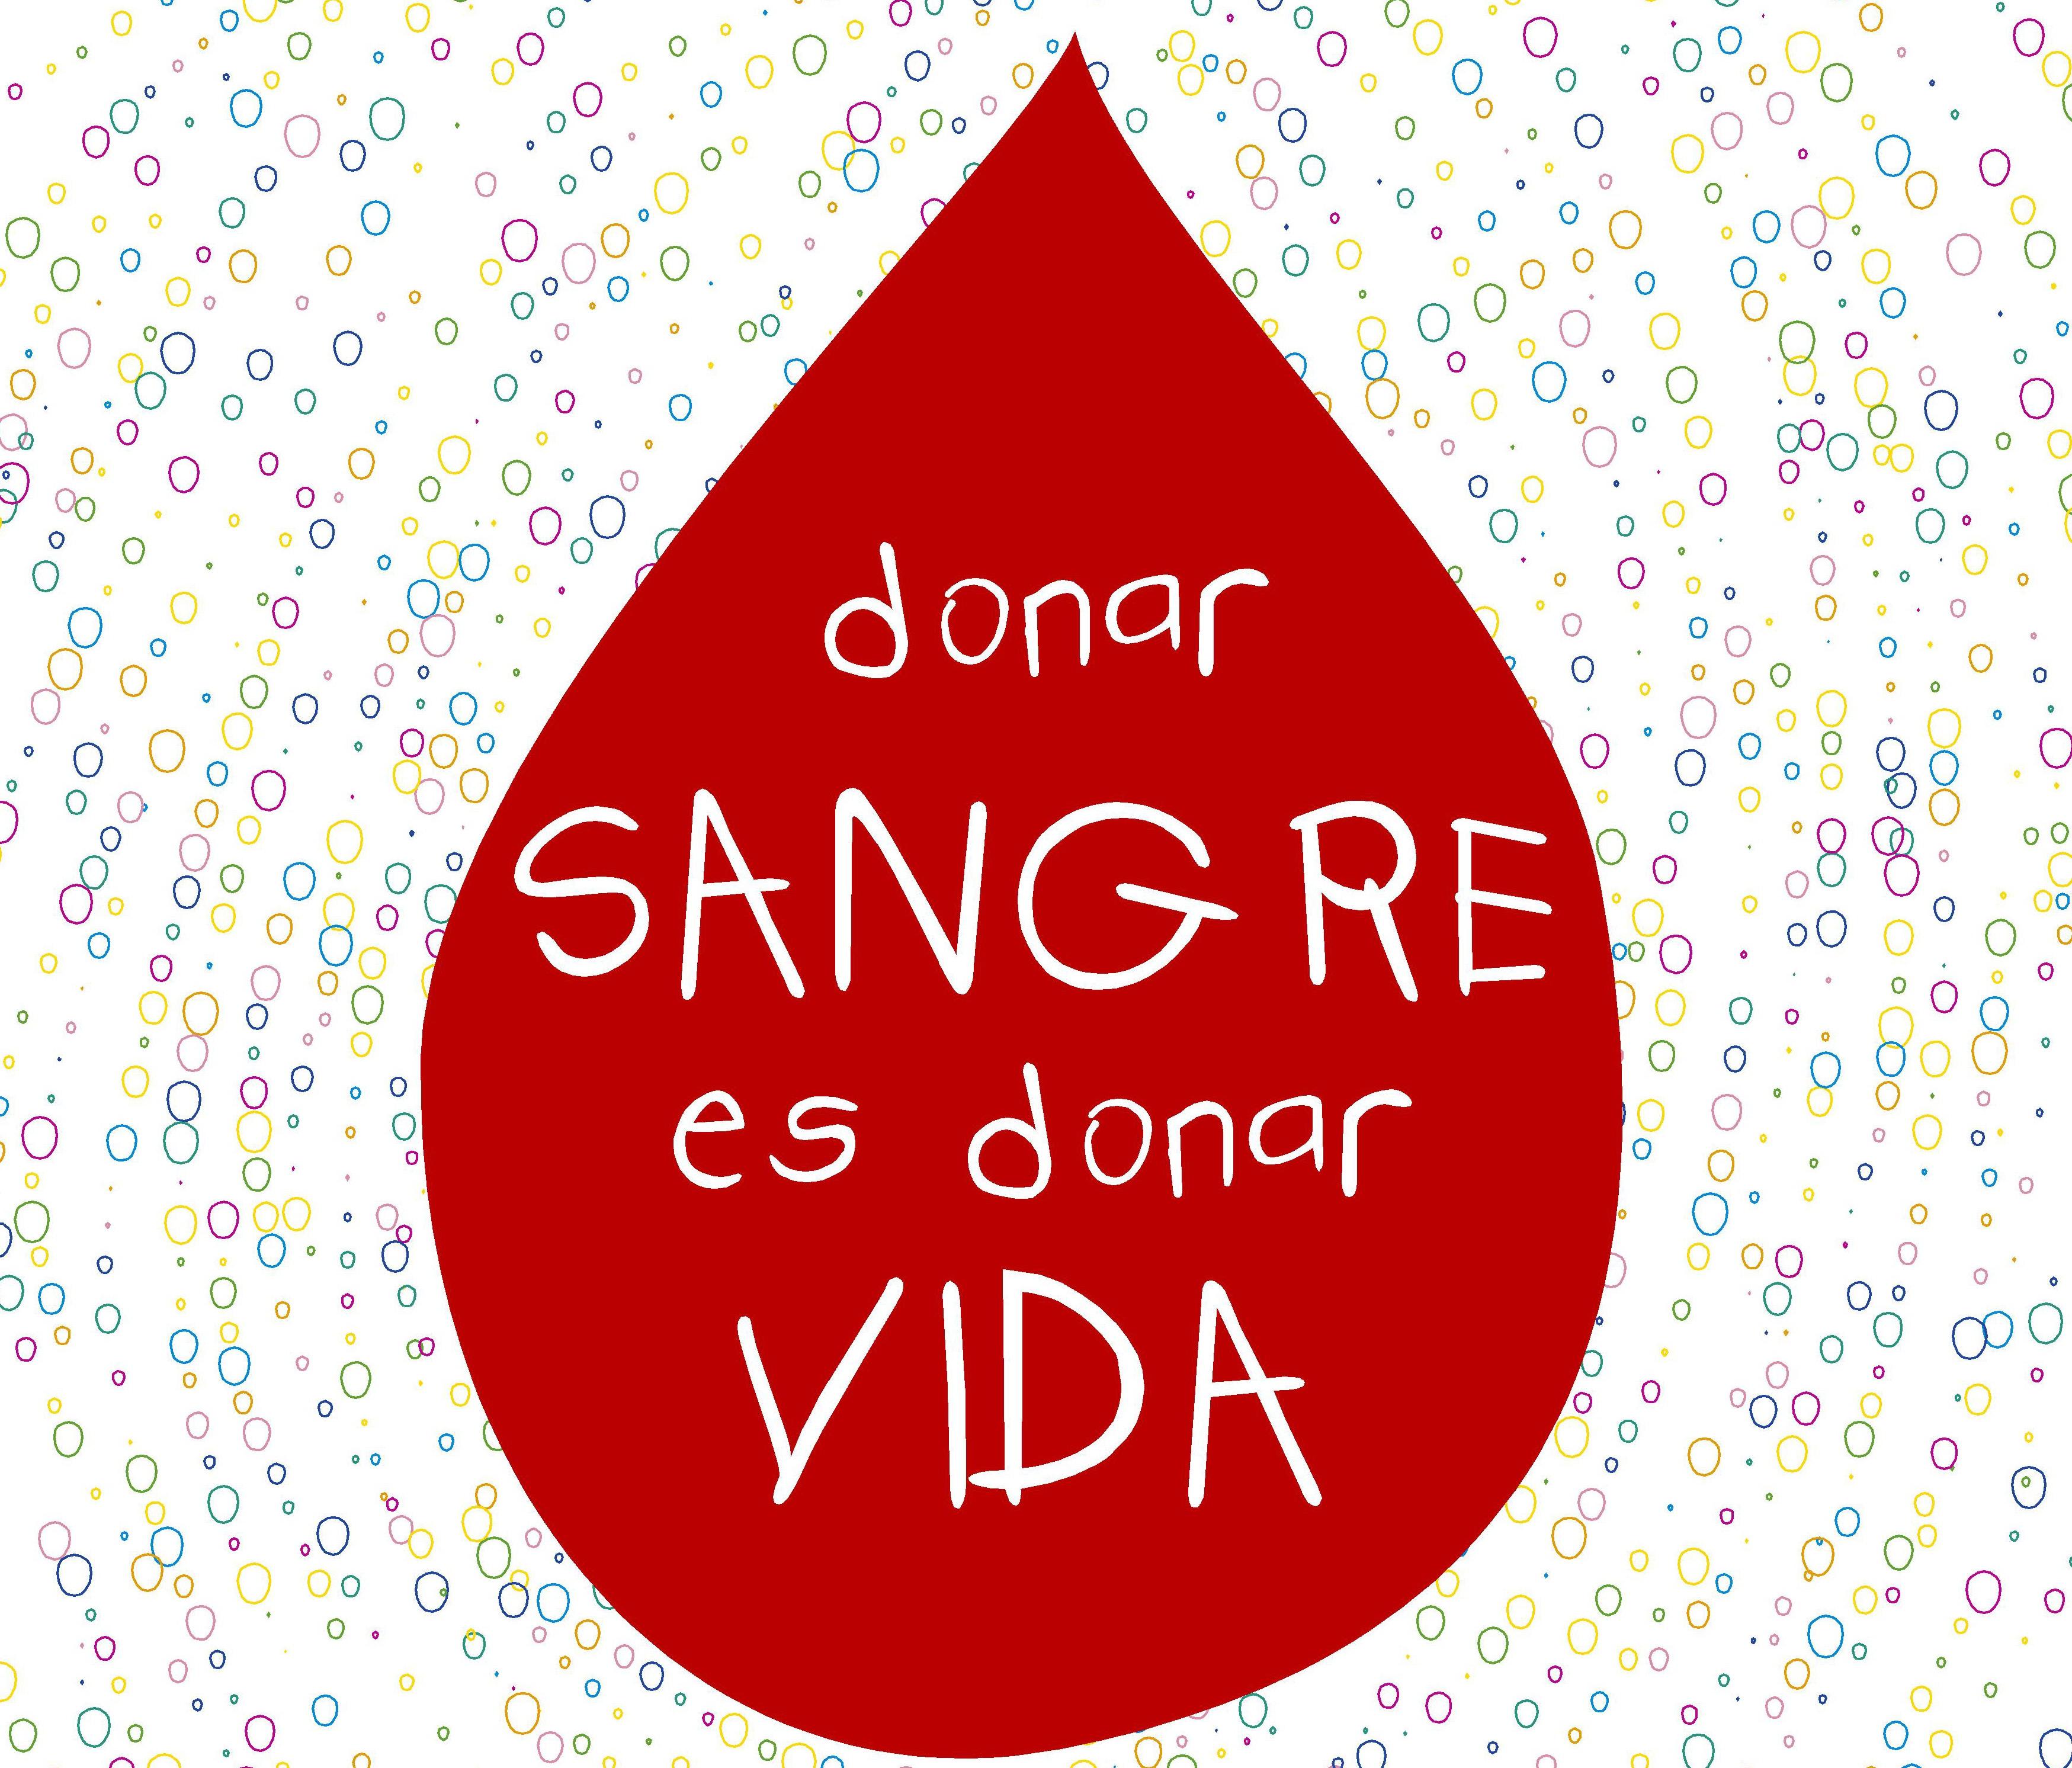 Pedido especial a dadores de sangre | imagen